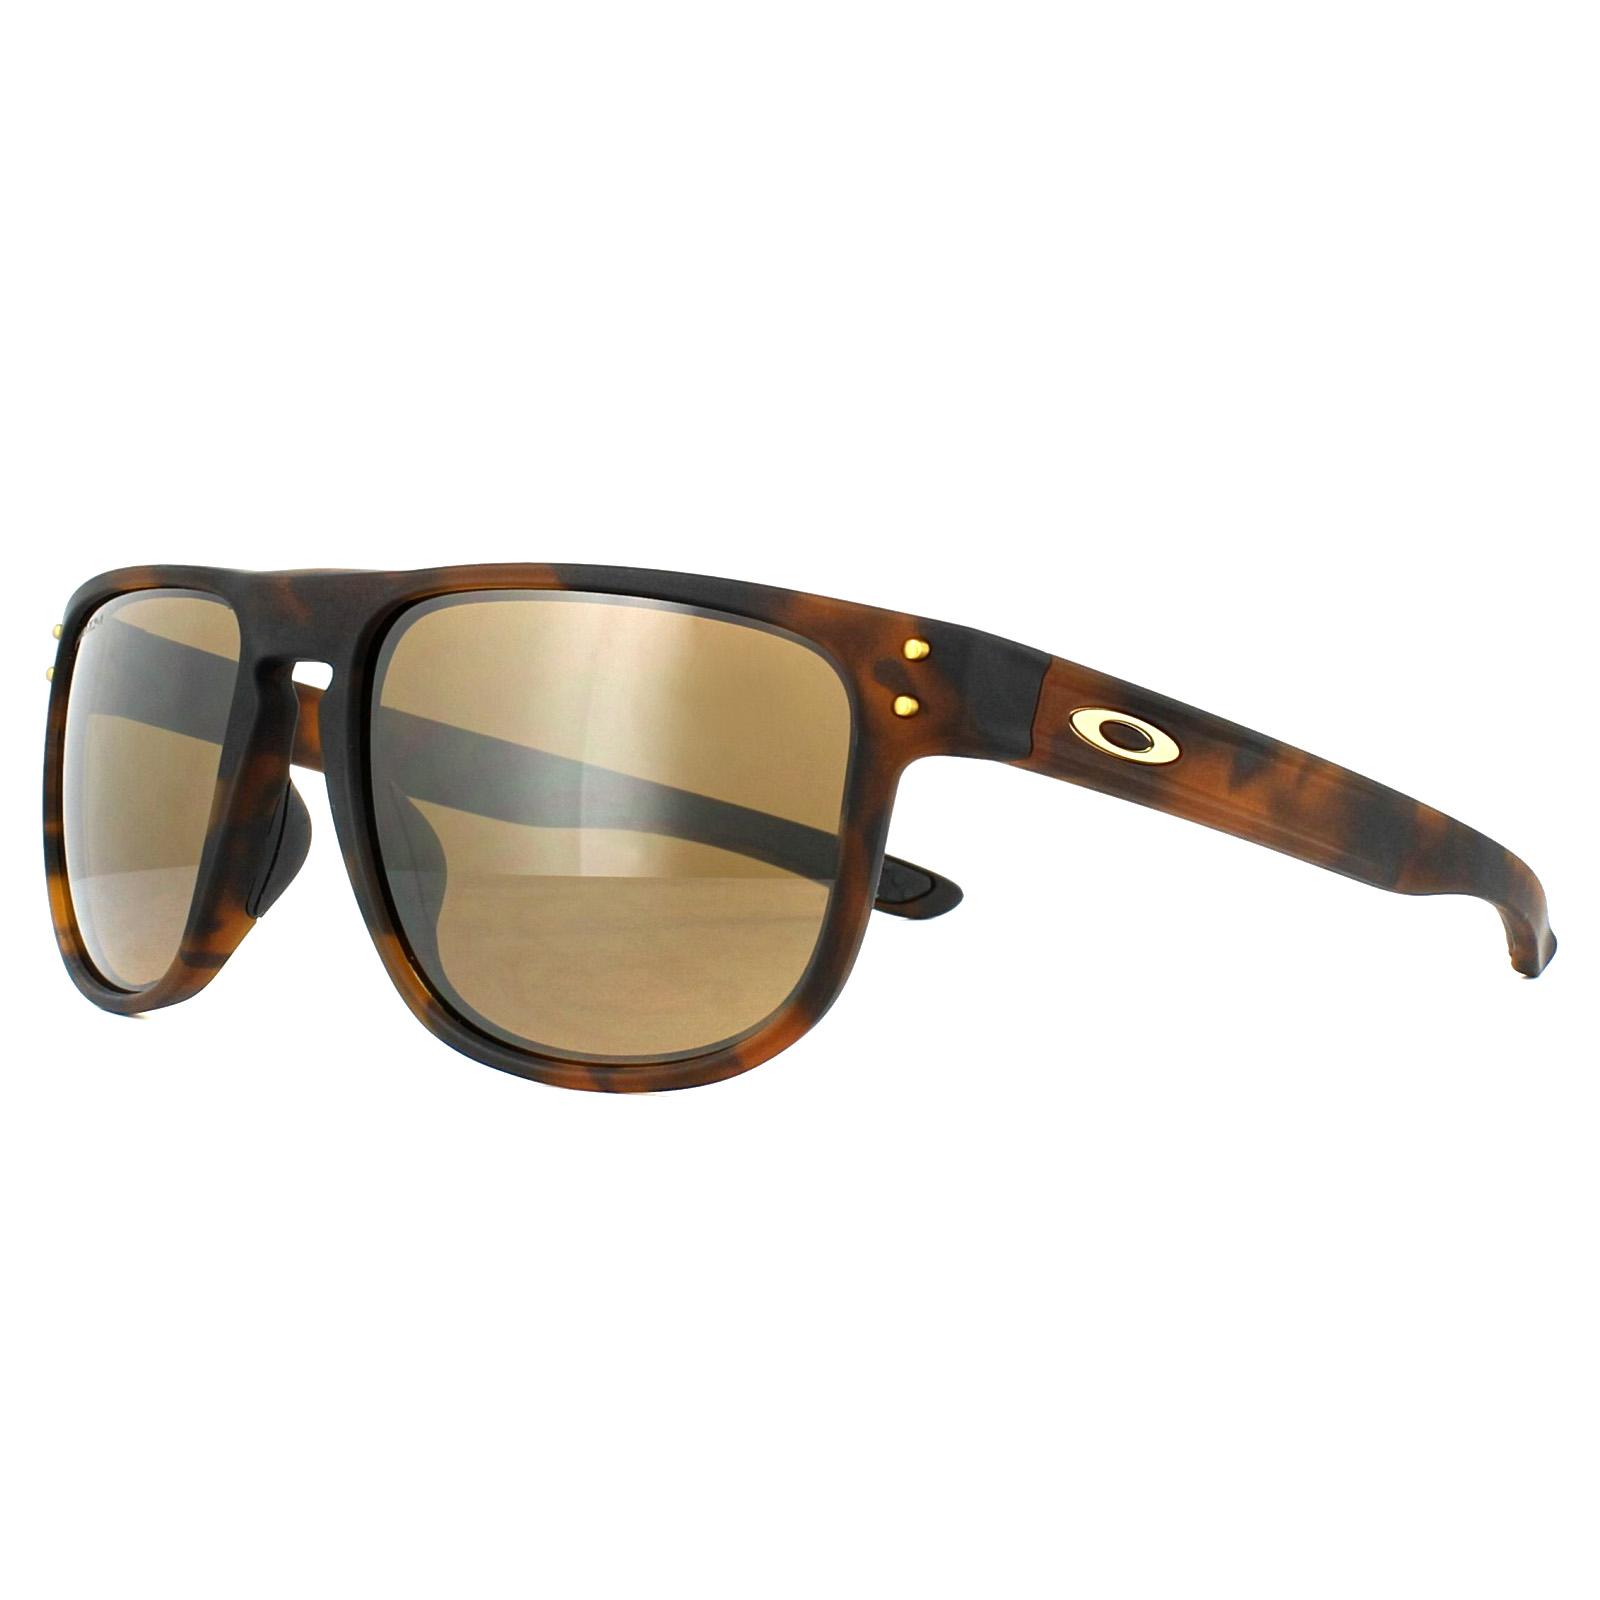 7c55d5421c Sentinel Oakley Sunglasses Holbrook R OO9377-06 Dark Tortoise Prizm  Tungsten Polarized